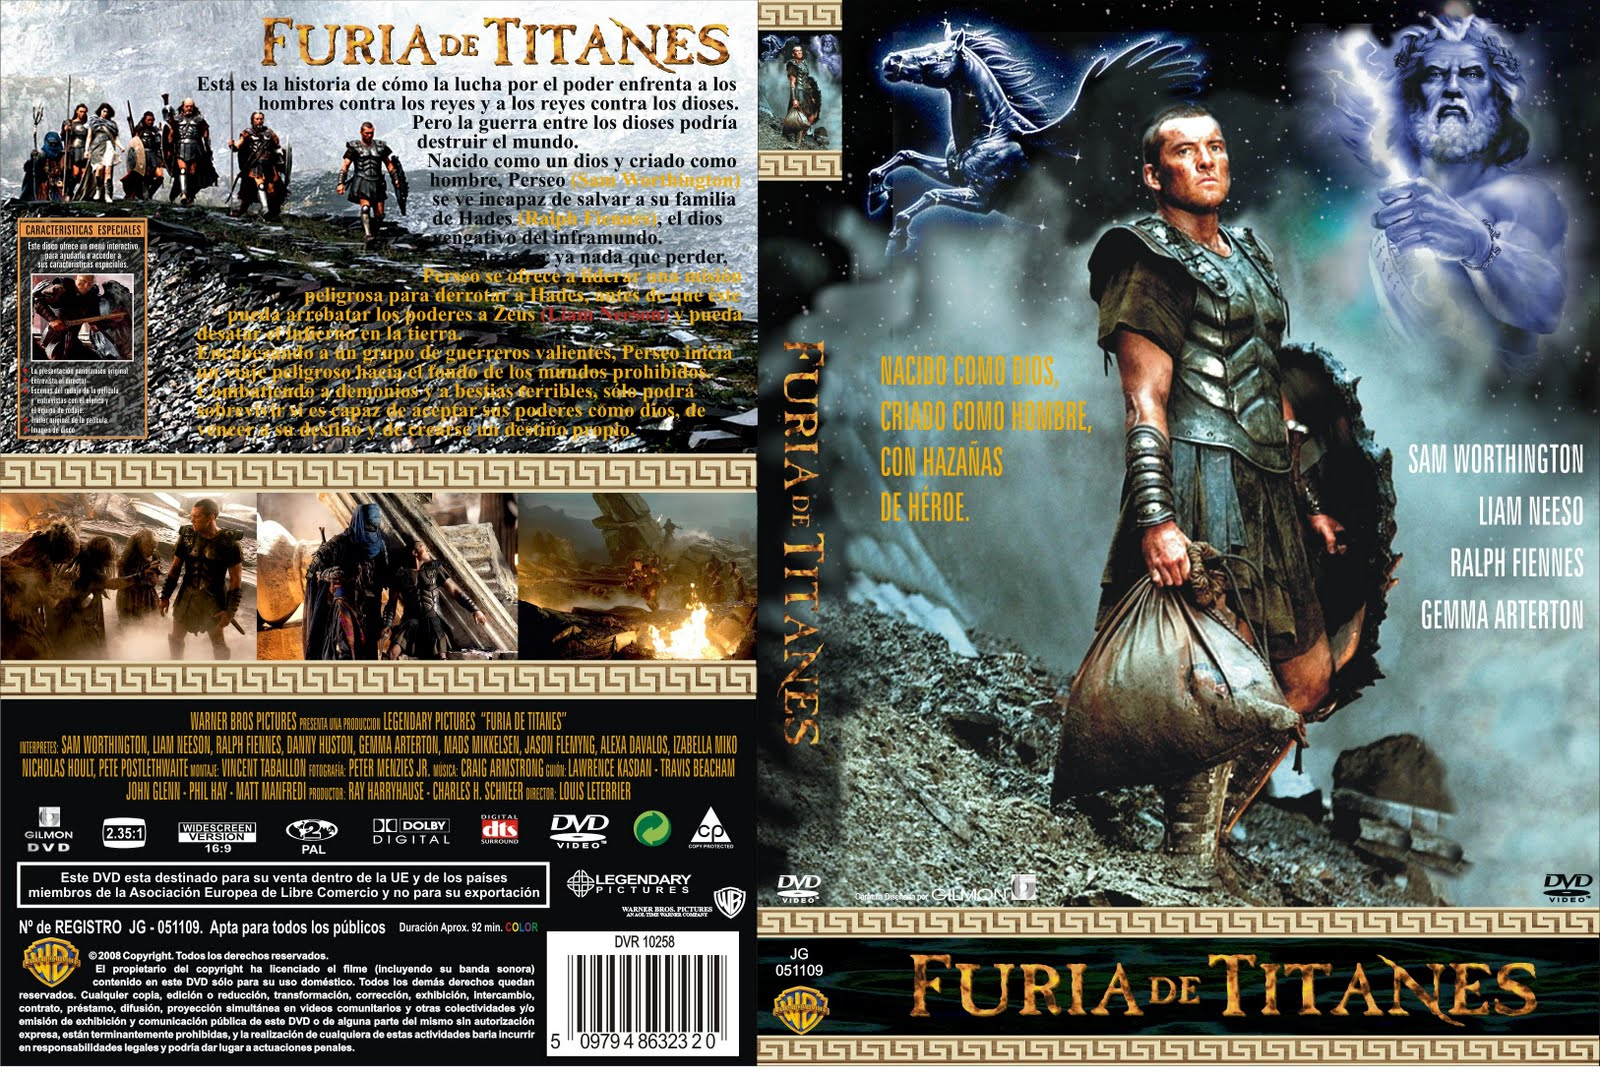 http://1.bp.blogspot.com/-Y5tSCX-gjNY/Tf5jeFFyQAI/AAAAAAAAAKQ/0z6cqAzXxJM/s1600/Furia_De_Titanes_-_2010_-_Custom_por_JhonGilmon_%255Bdvd%255D_80.jpg